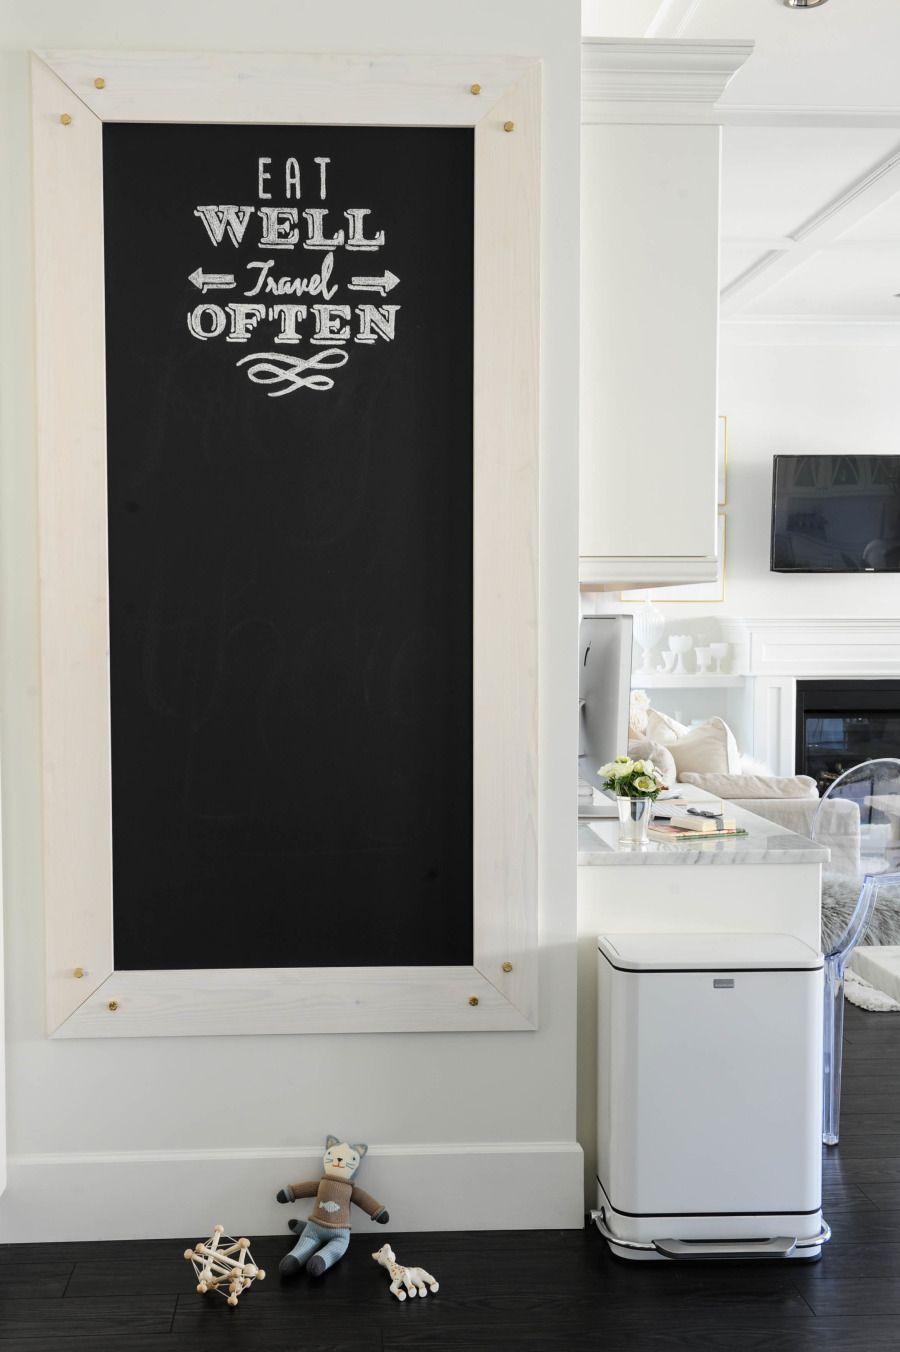 deco tableau noir cuisine message  Ardoise cuisine, Design de